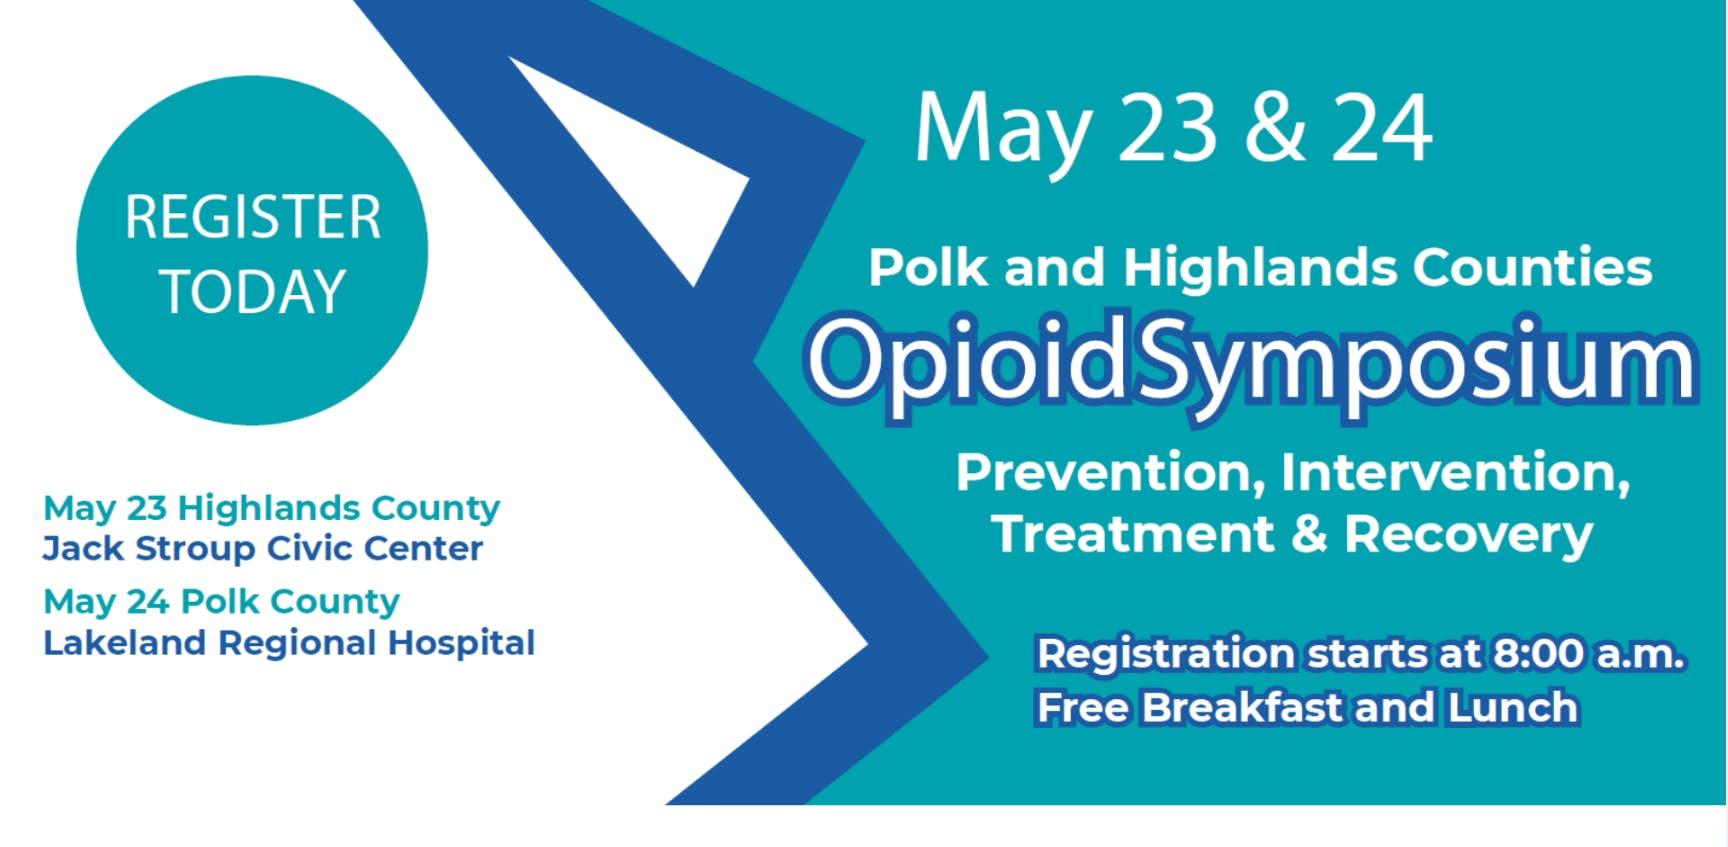 Opioid Symposium - Polk County - 24 MAY 2019